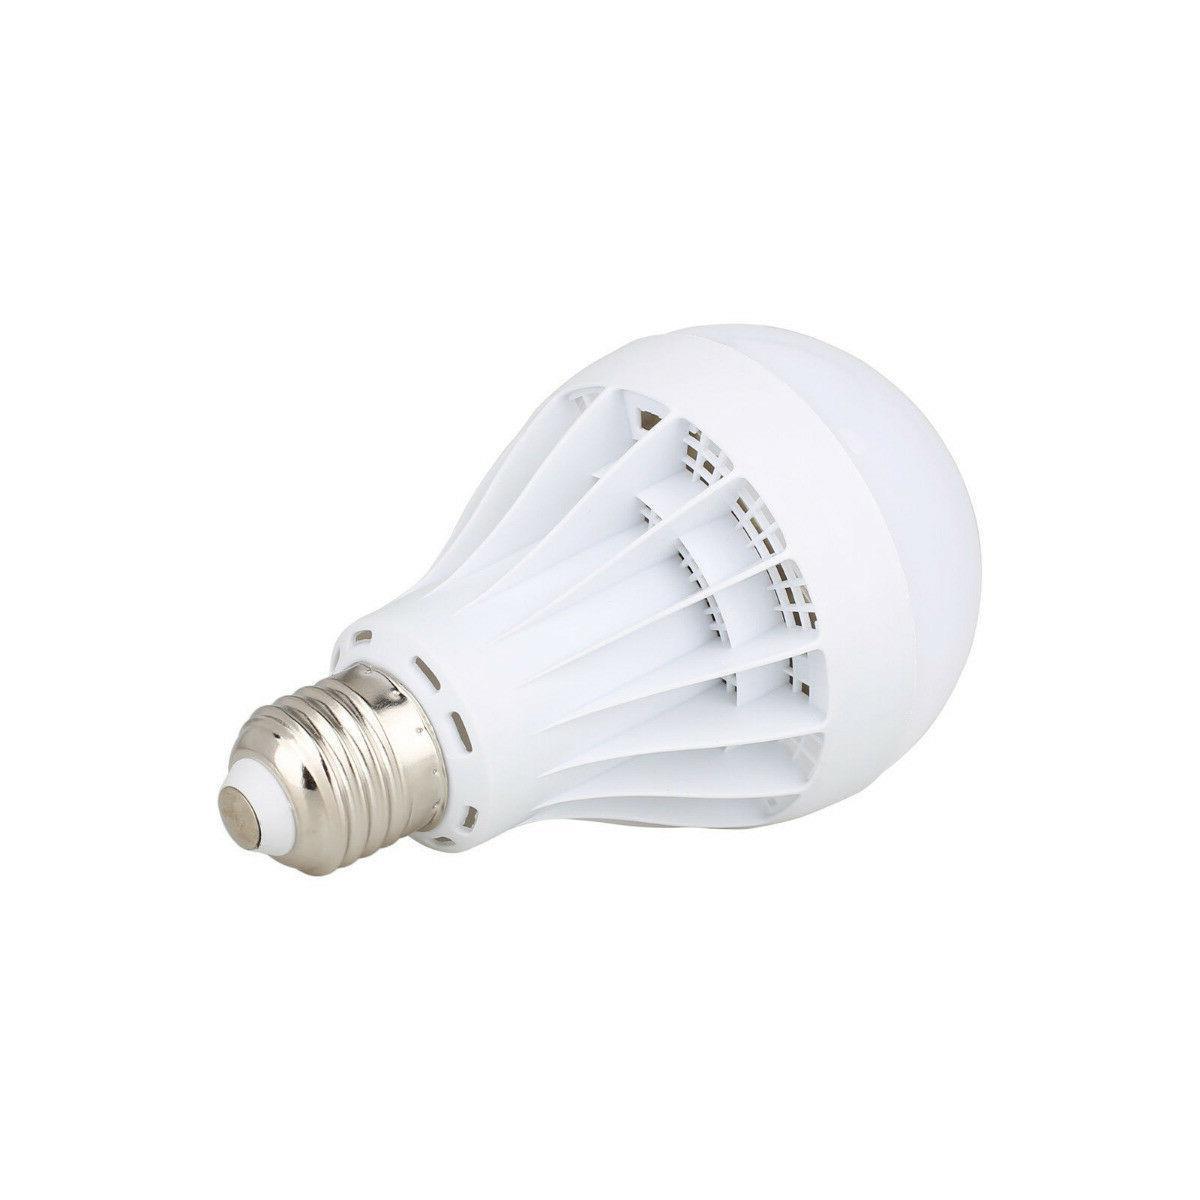 2020 LED E27 Saving 5W 15W 110V